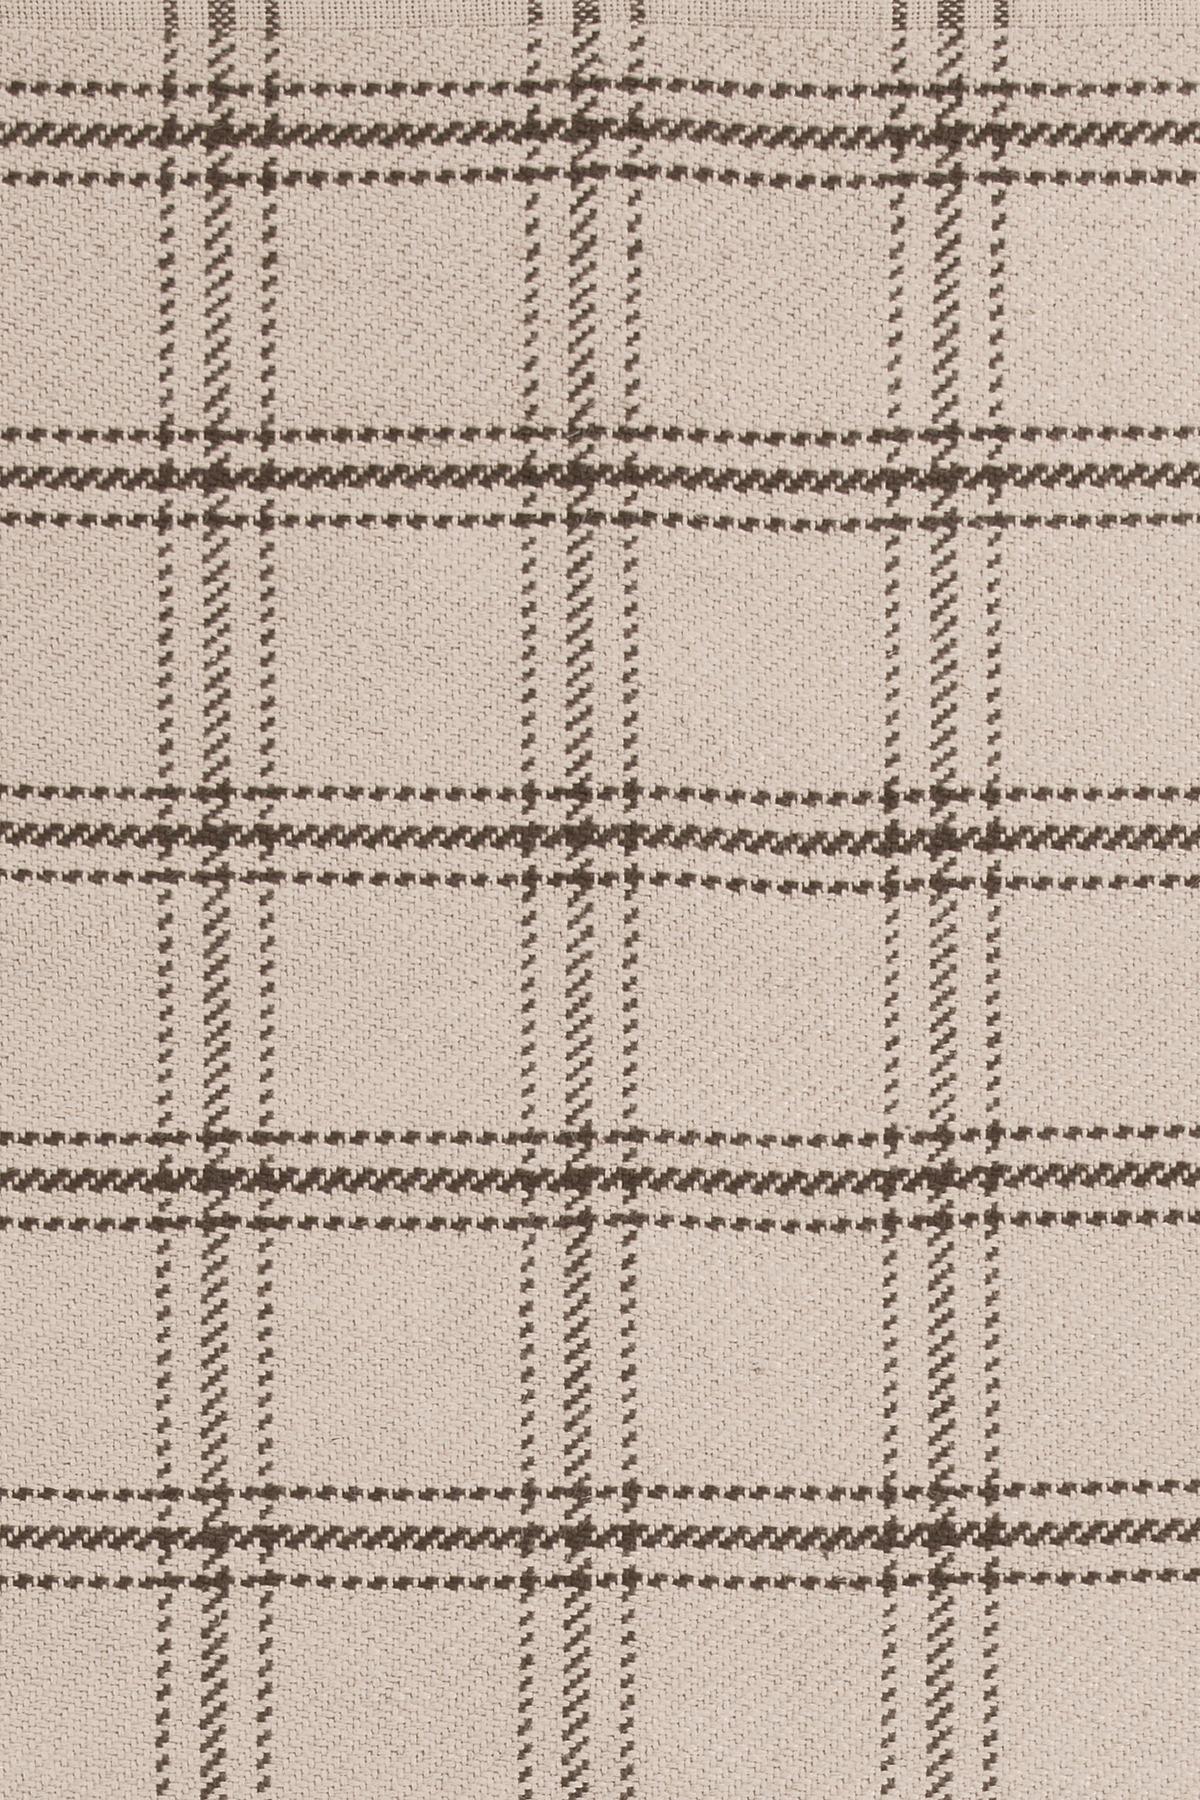 Cooper Oak Jute Woven Rug